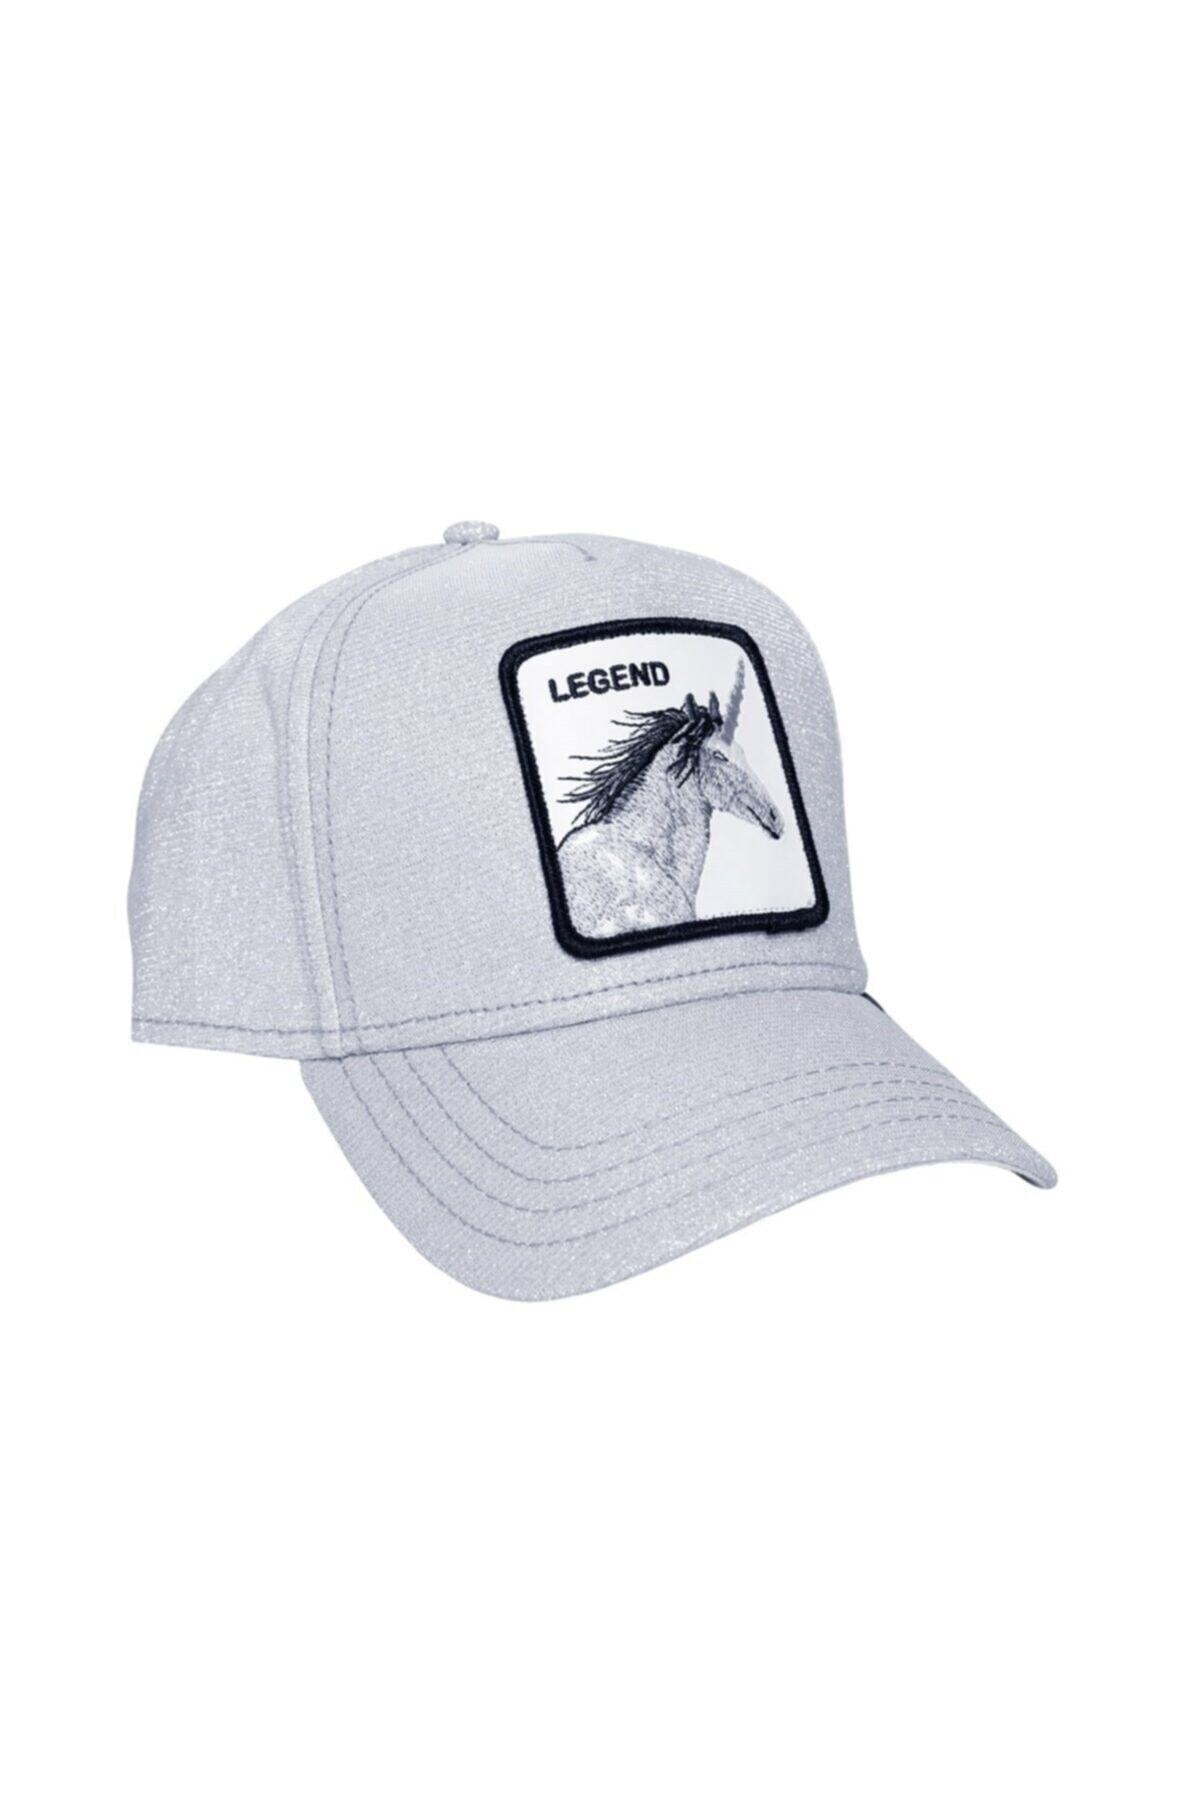 Goorin Bros Unisex Beyaz Believer Şapka 2